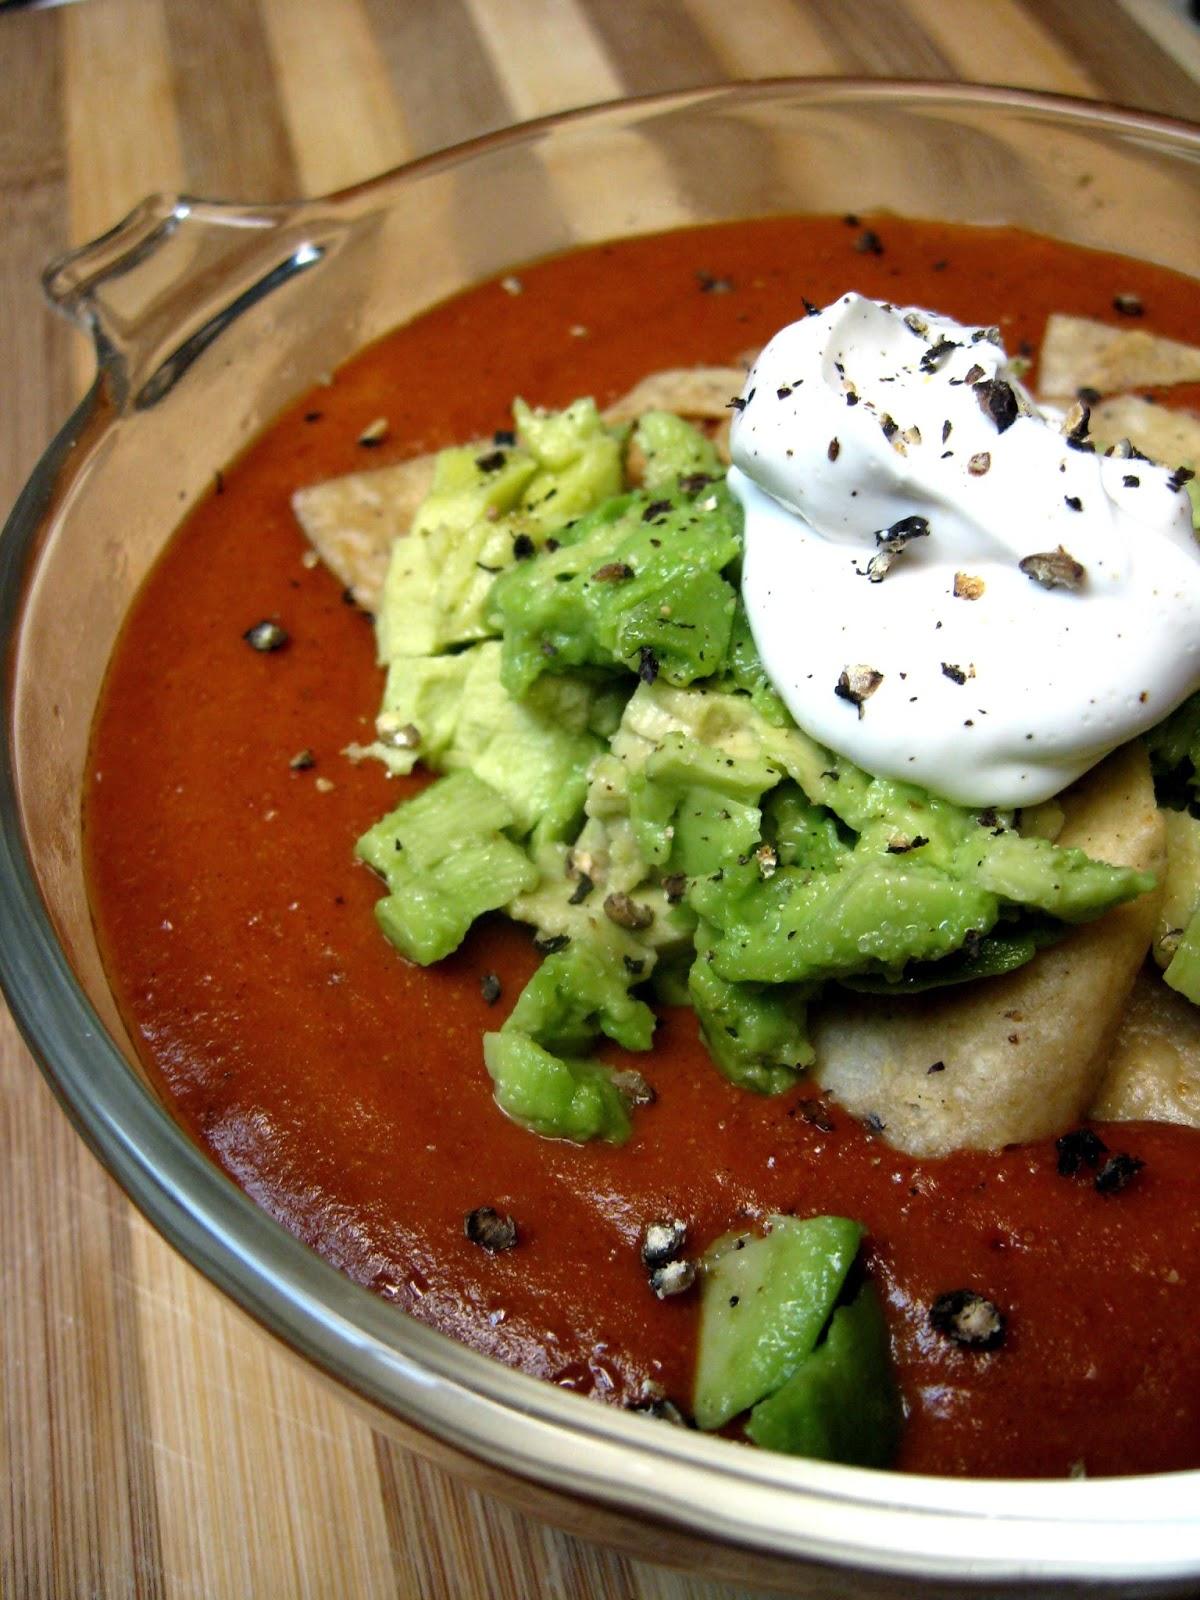 justthefood.com...the blog: Vegan MoFo VIII, Day 3 ...